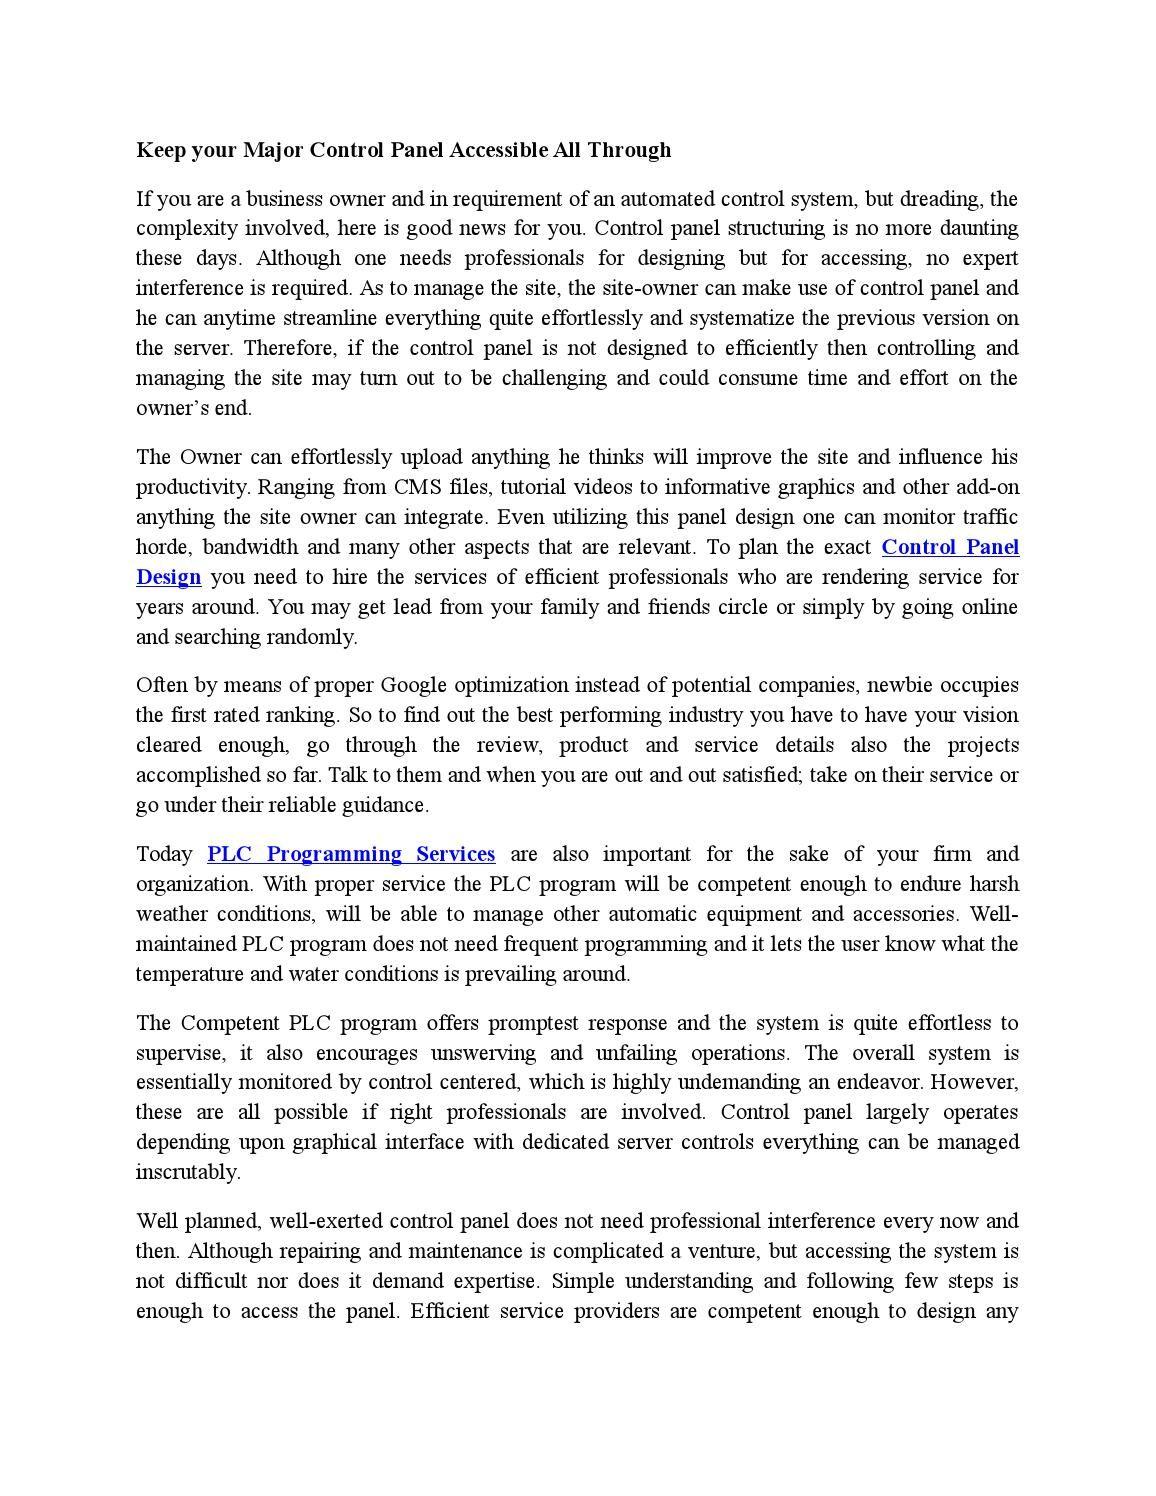 Competent design of the essay